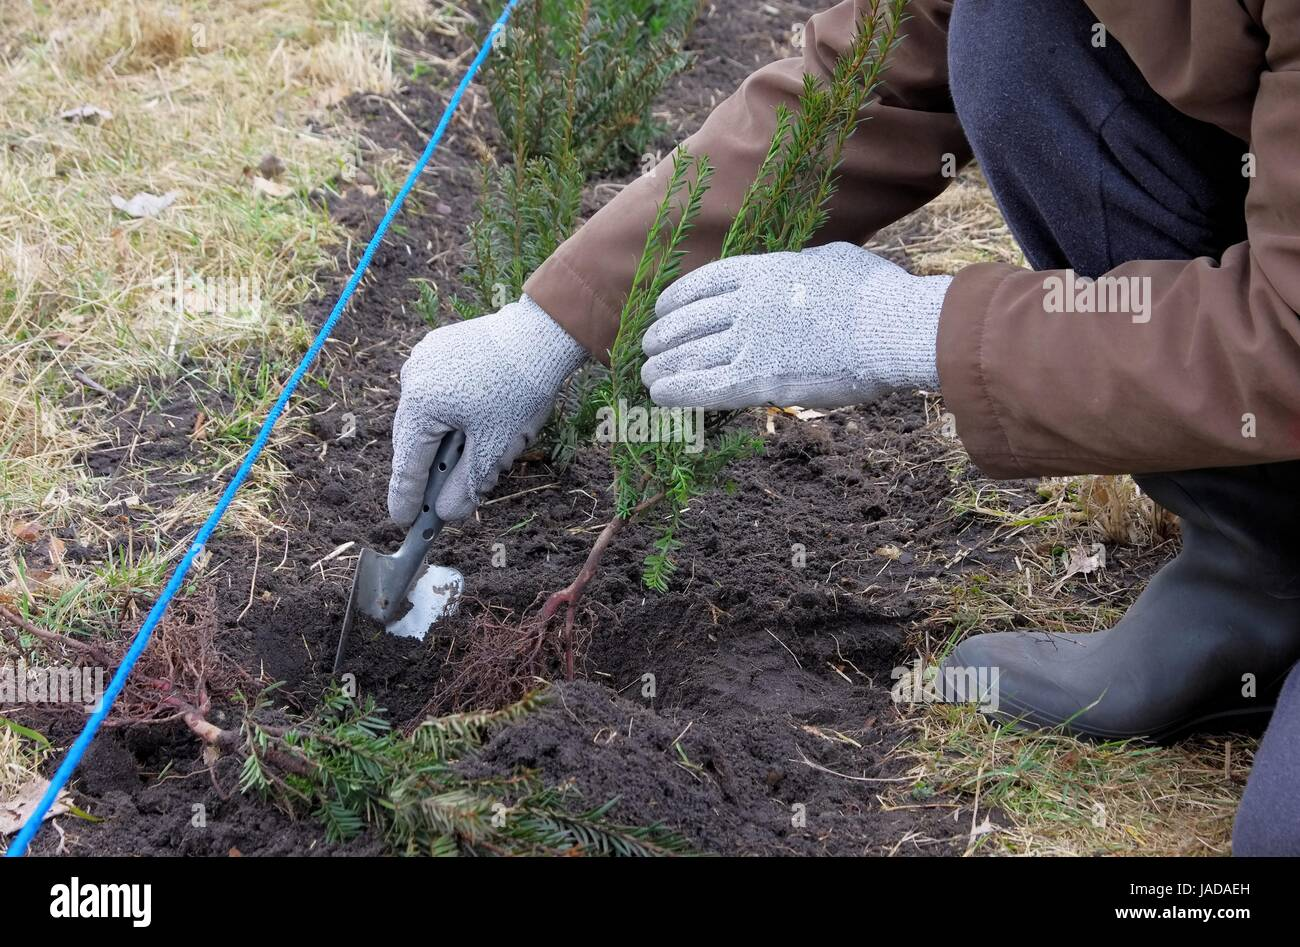 Hecke pflanzen Eibe planting a taxus hedge 04 Stock